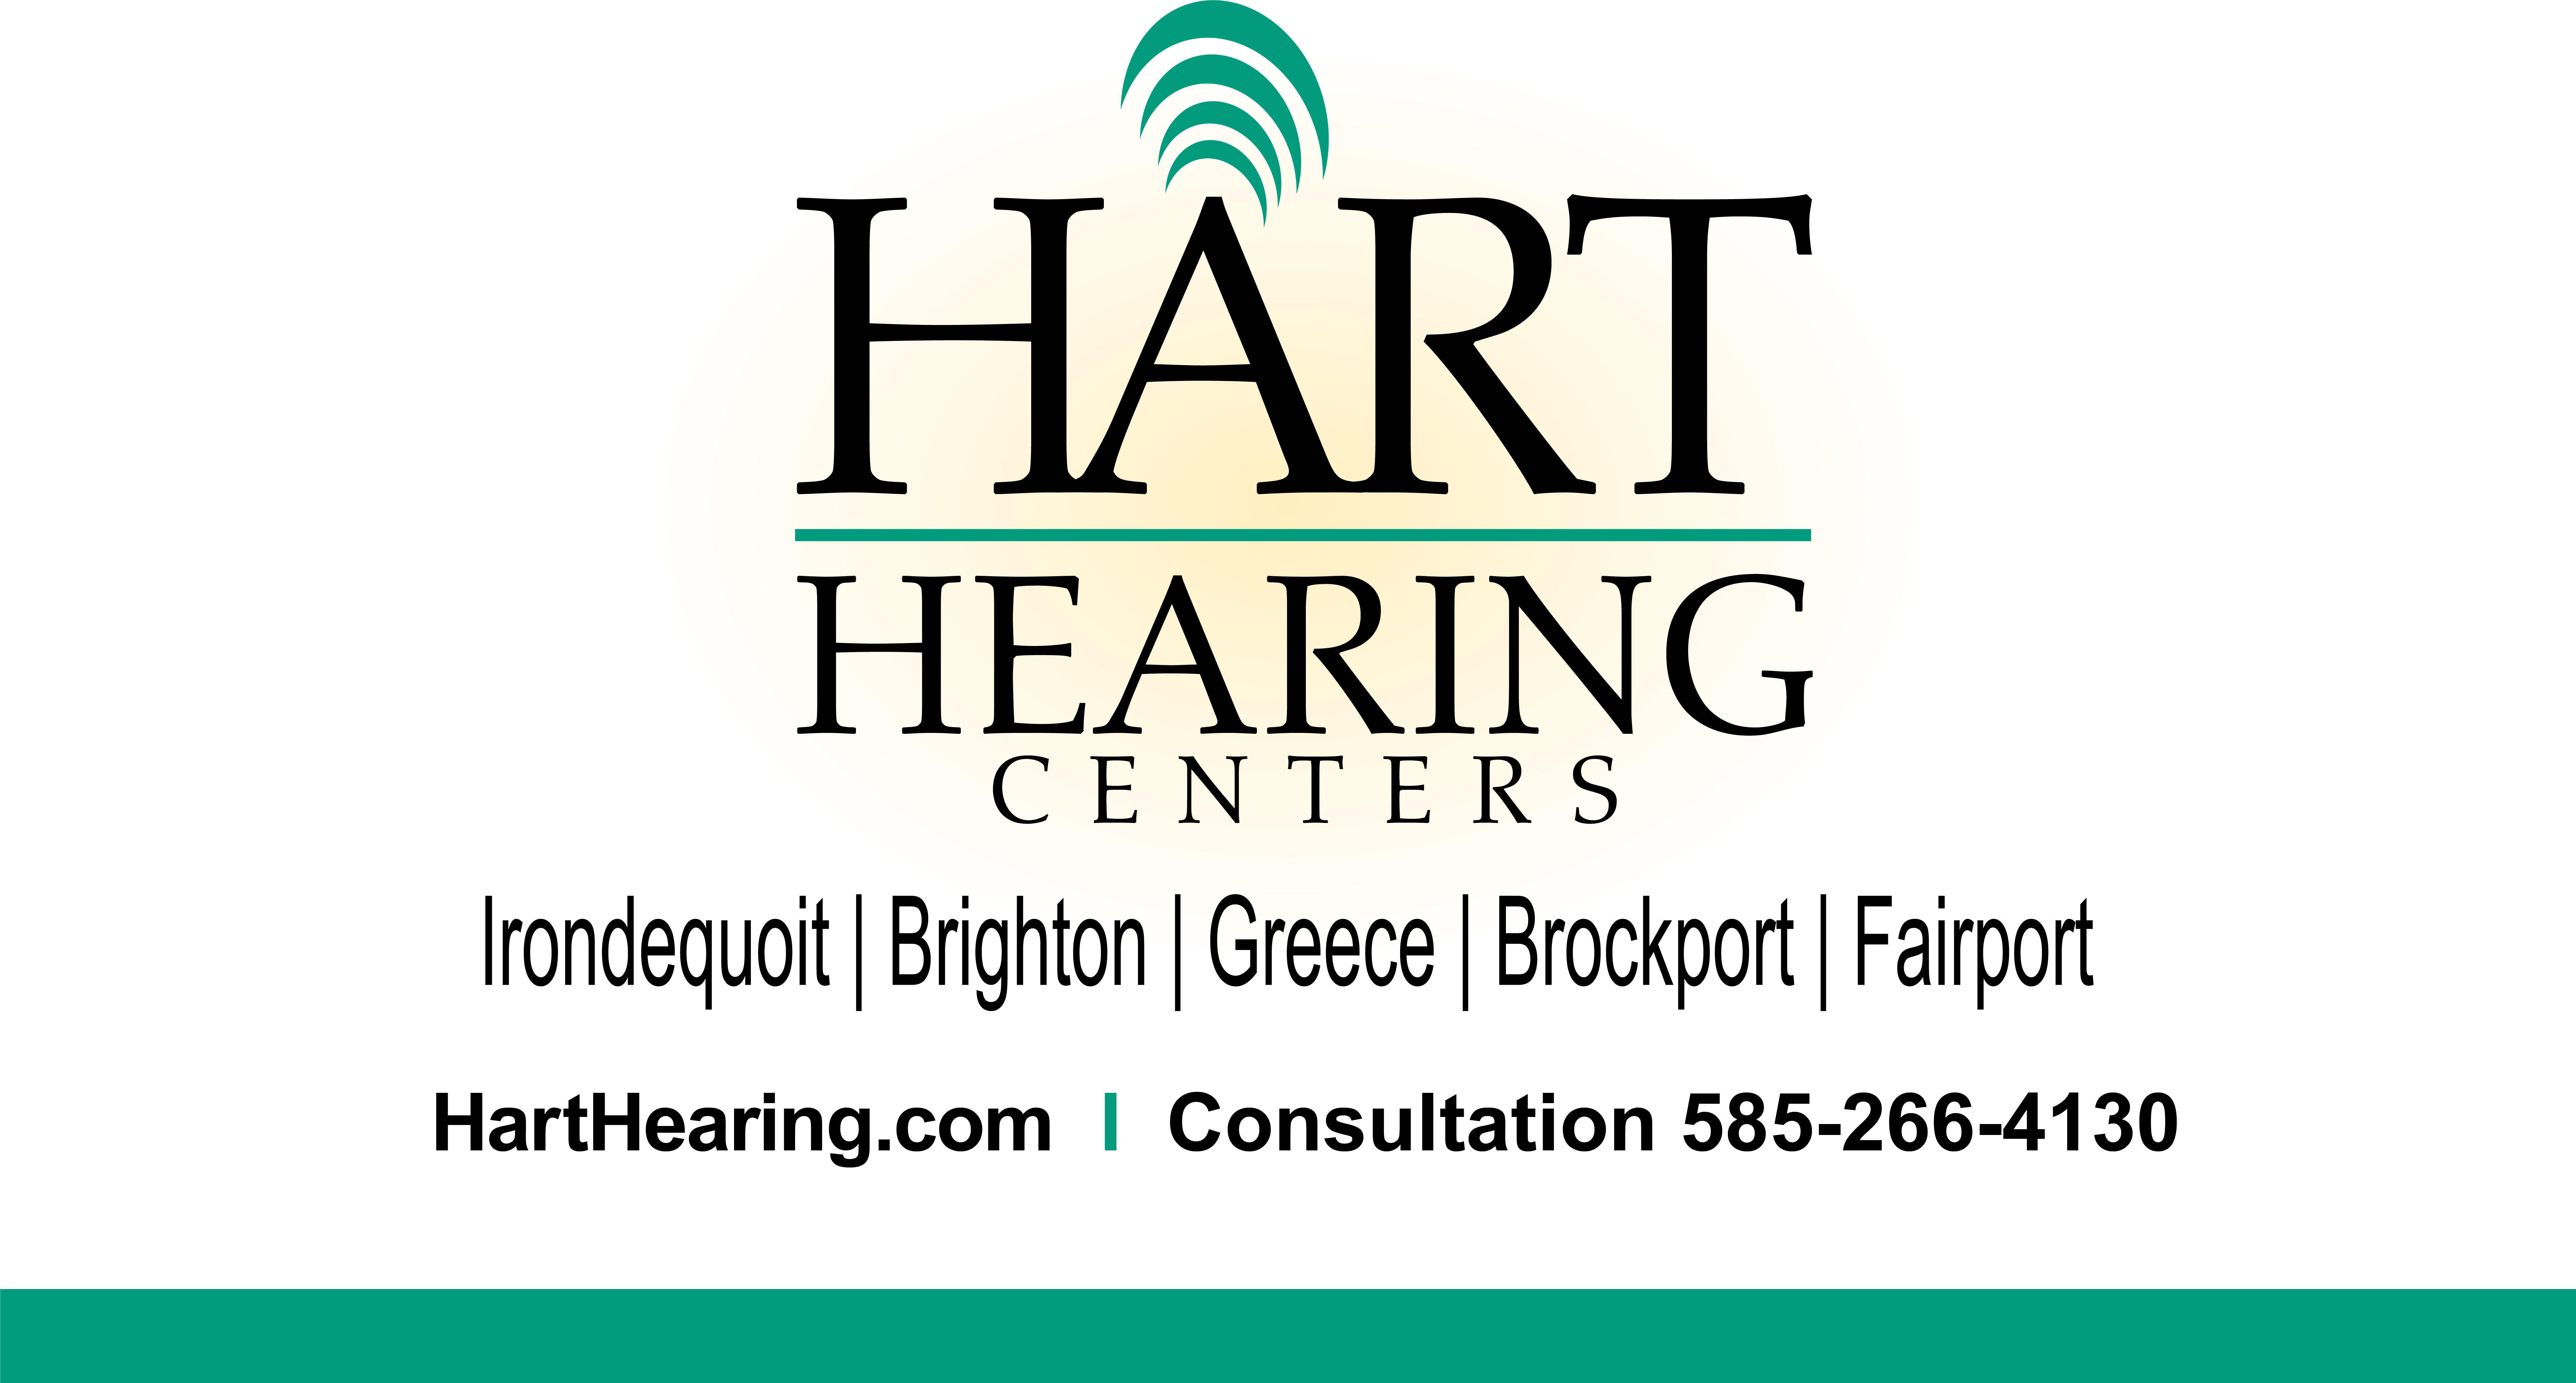 Hart Hearing Centers